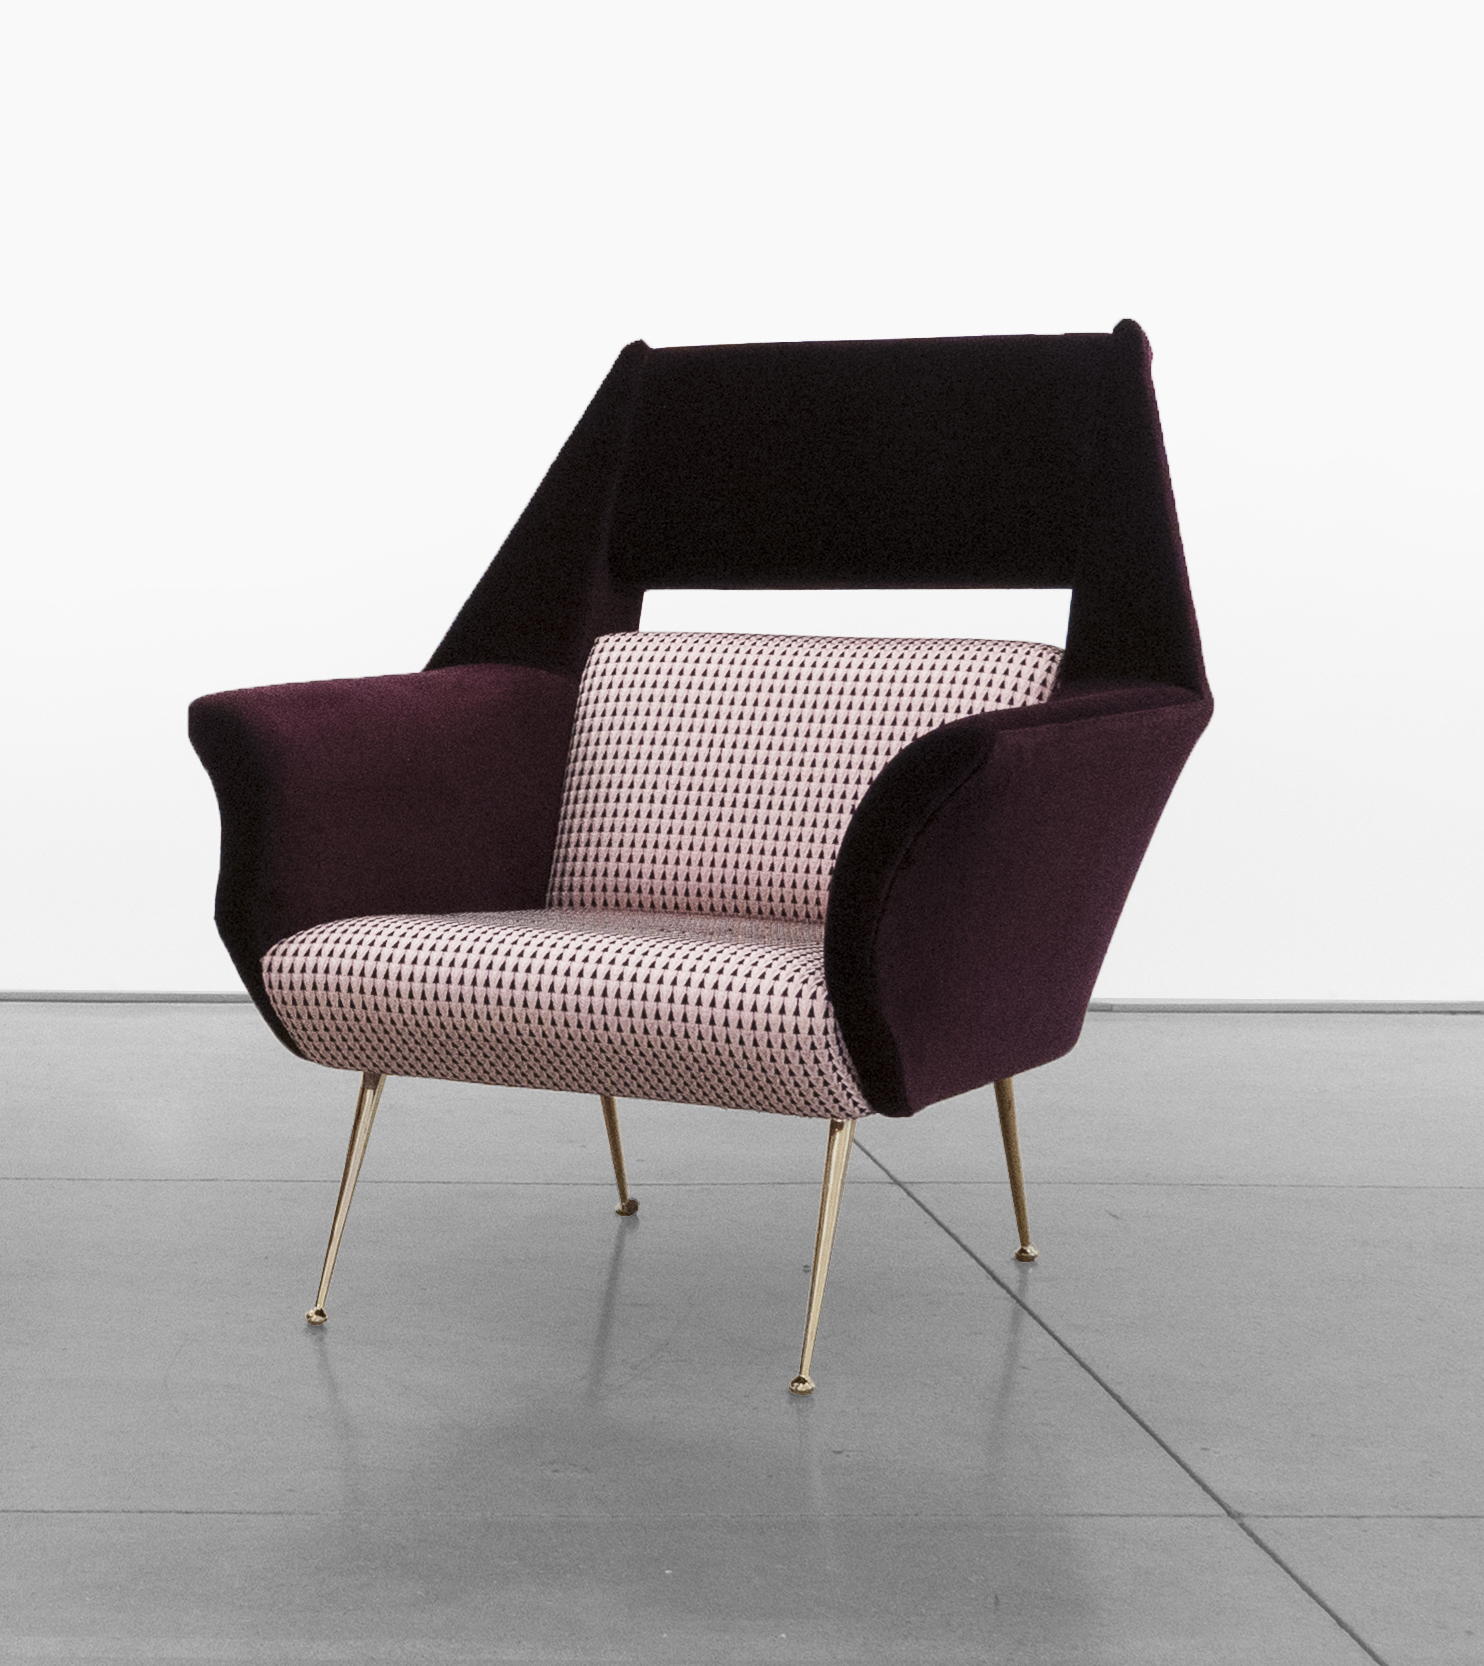 Gigi Radice, Chairs for Minotti, c. 1950 - 1959, Brass, Dedar Milano Upholstery, 31 H x 28 W x 29 D inches_4 copy.jpg